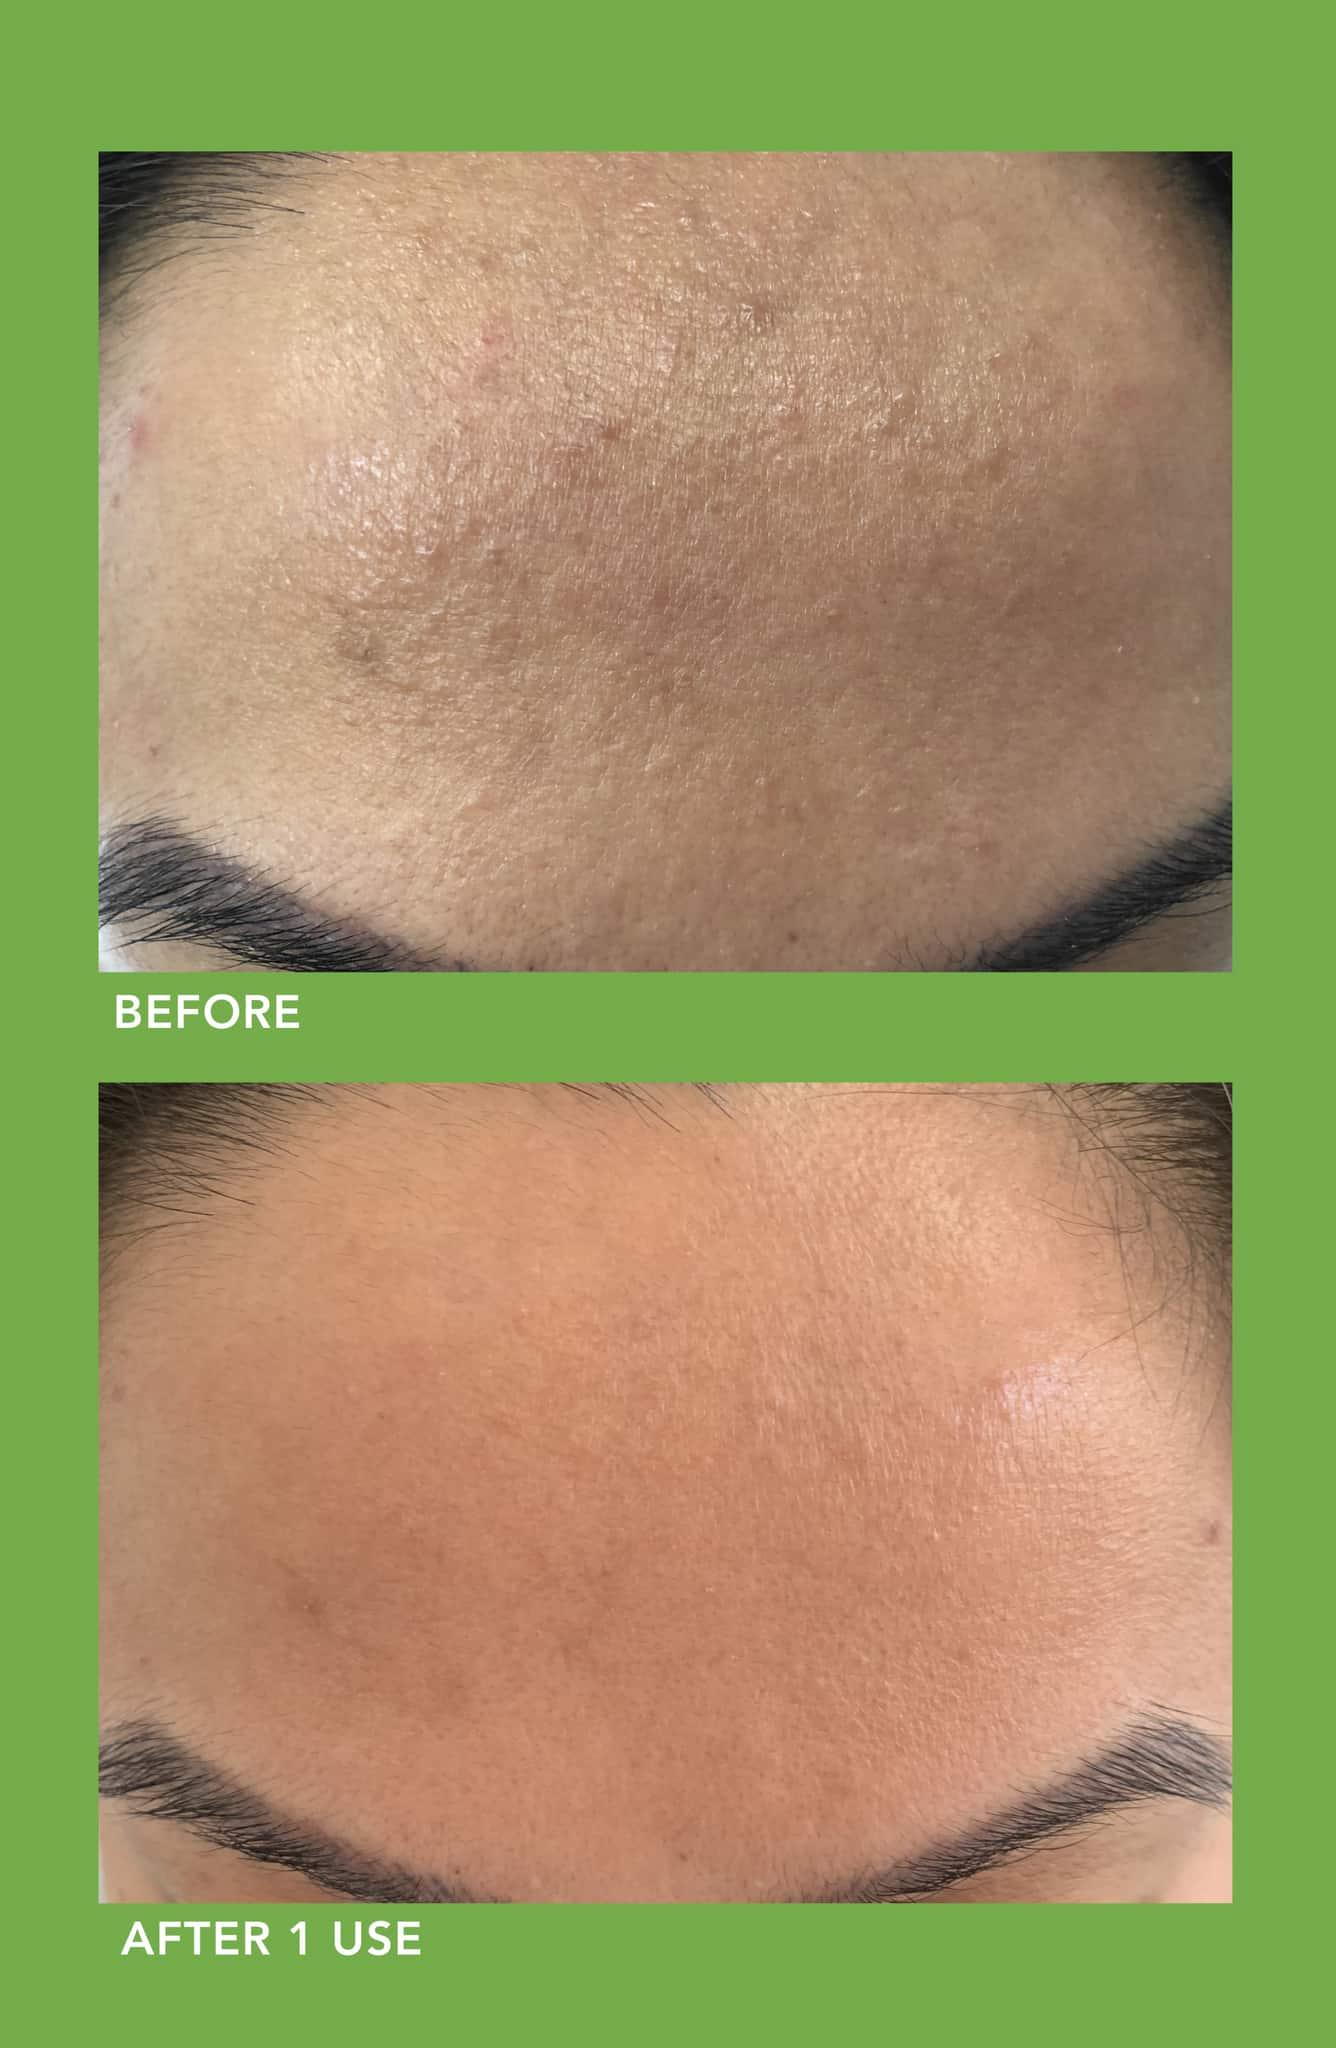 Lancer Skincare Clarifying Detox Mask with Green Tea + 3% Sulfur